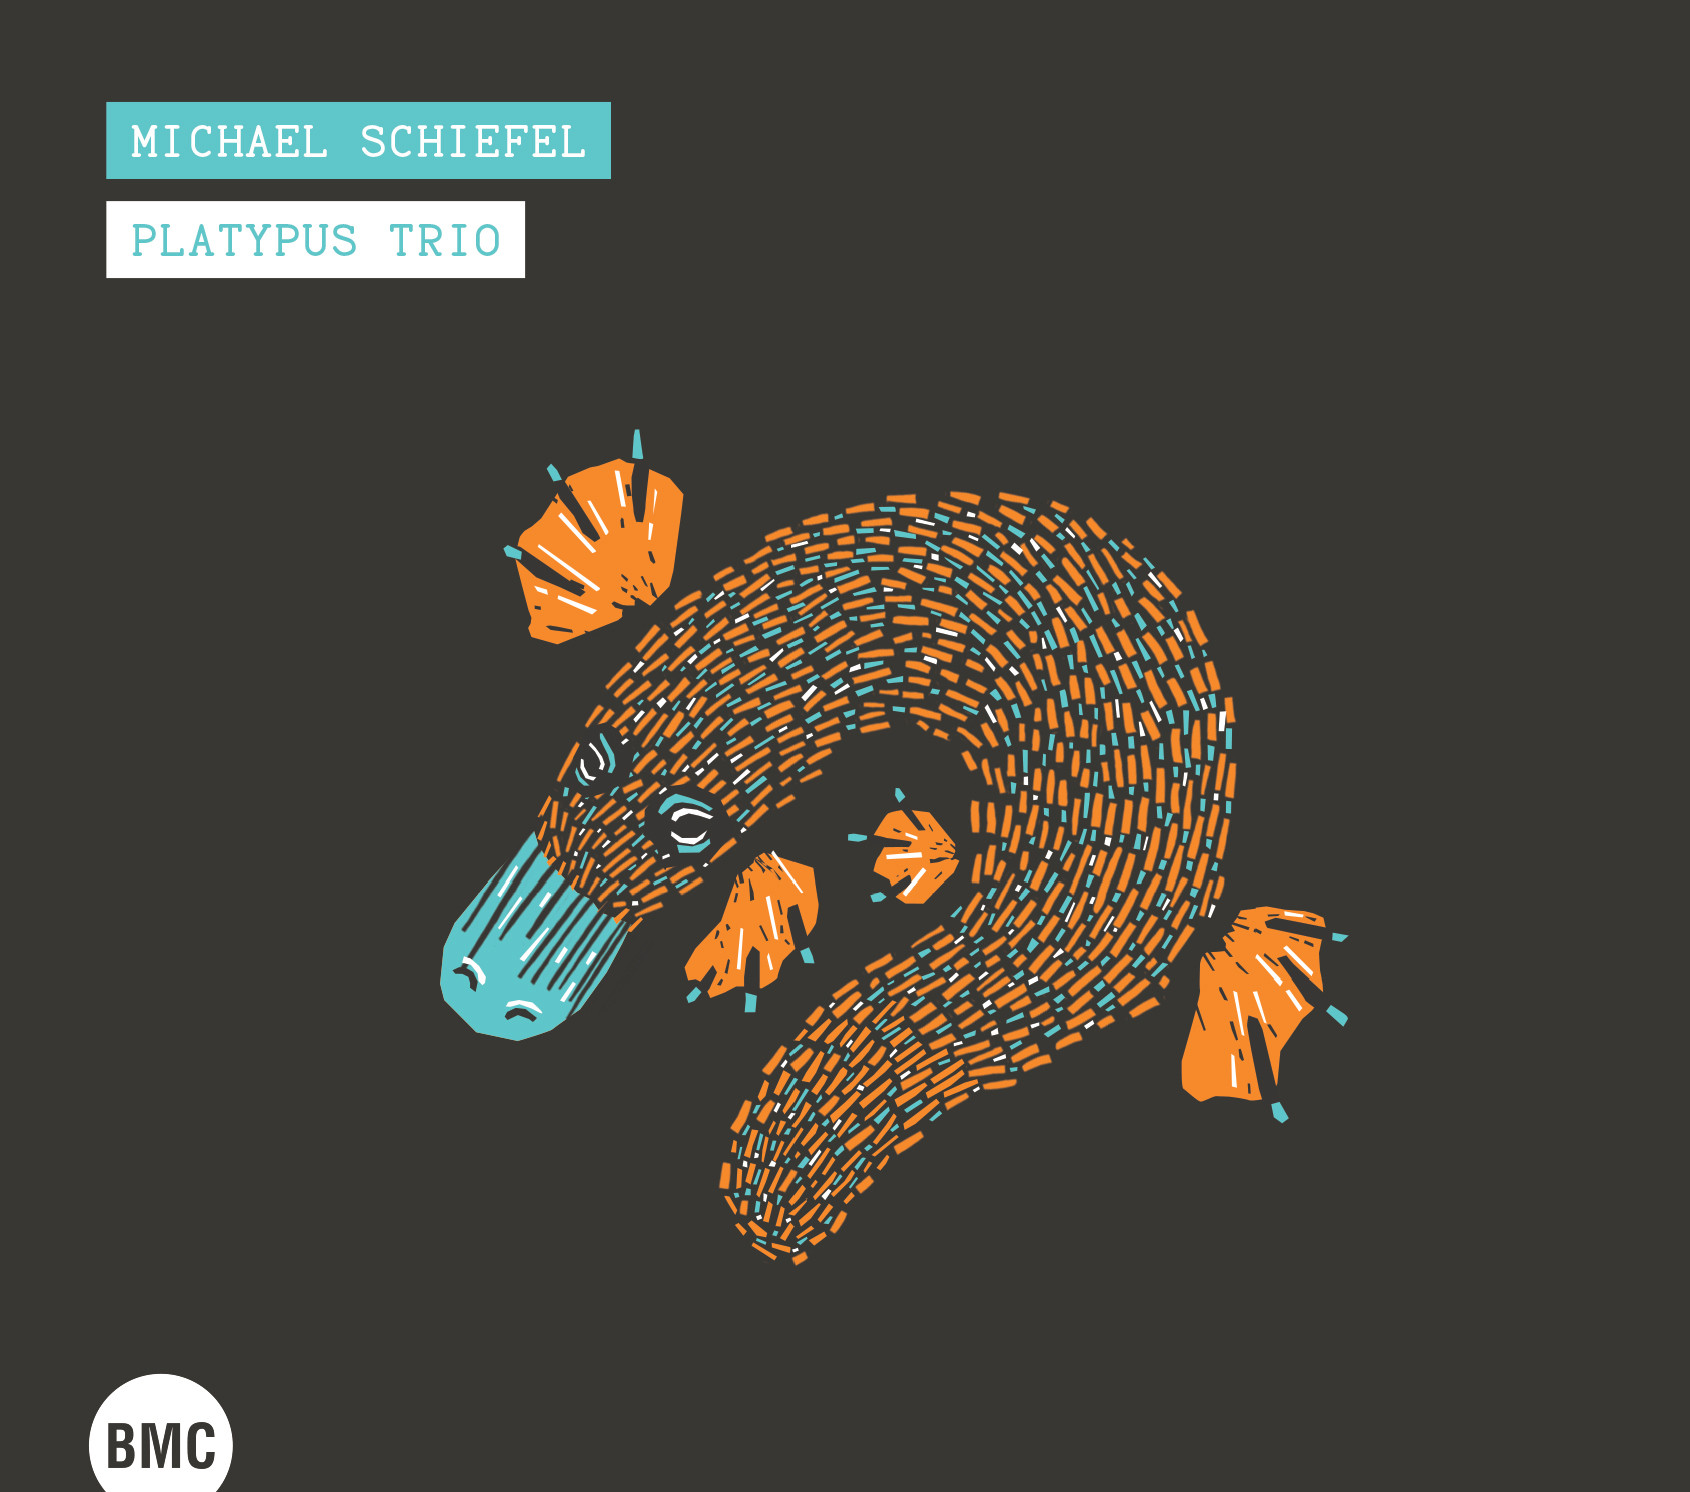 fhd_bmc_cd_207_michael_schiefel_platypus_trio_cover_rgb.jpg